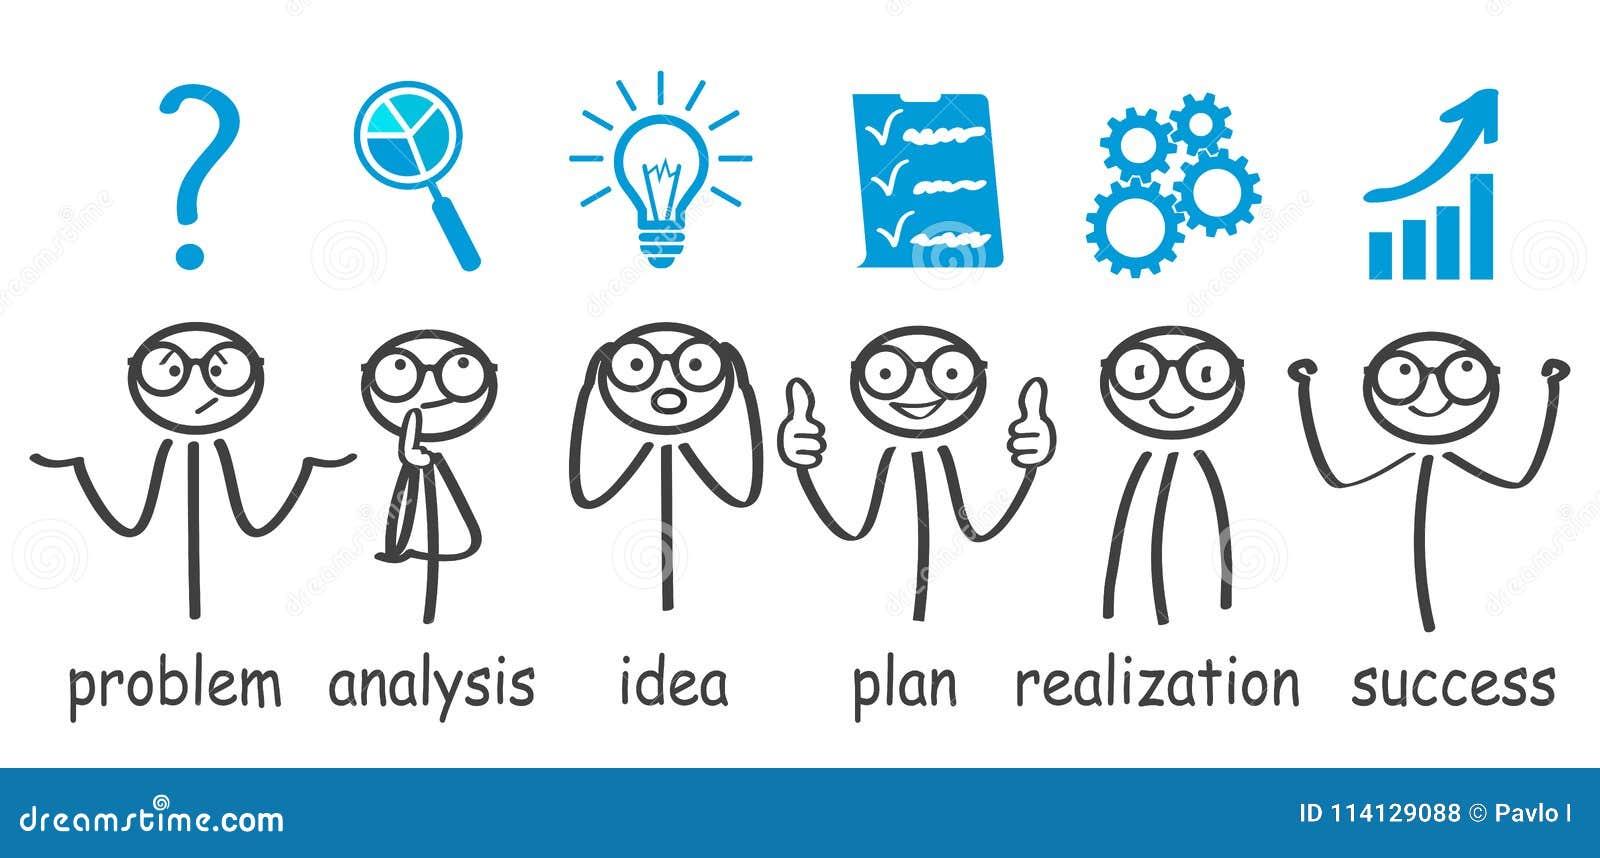 Steps decision problem, solving process, generator ideas, succeed – vector